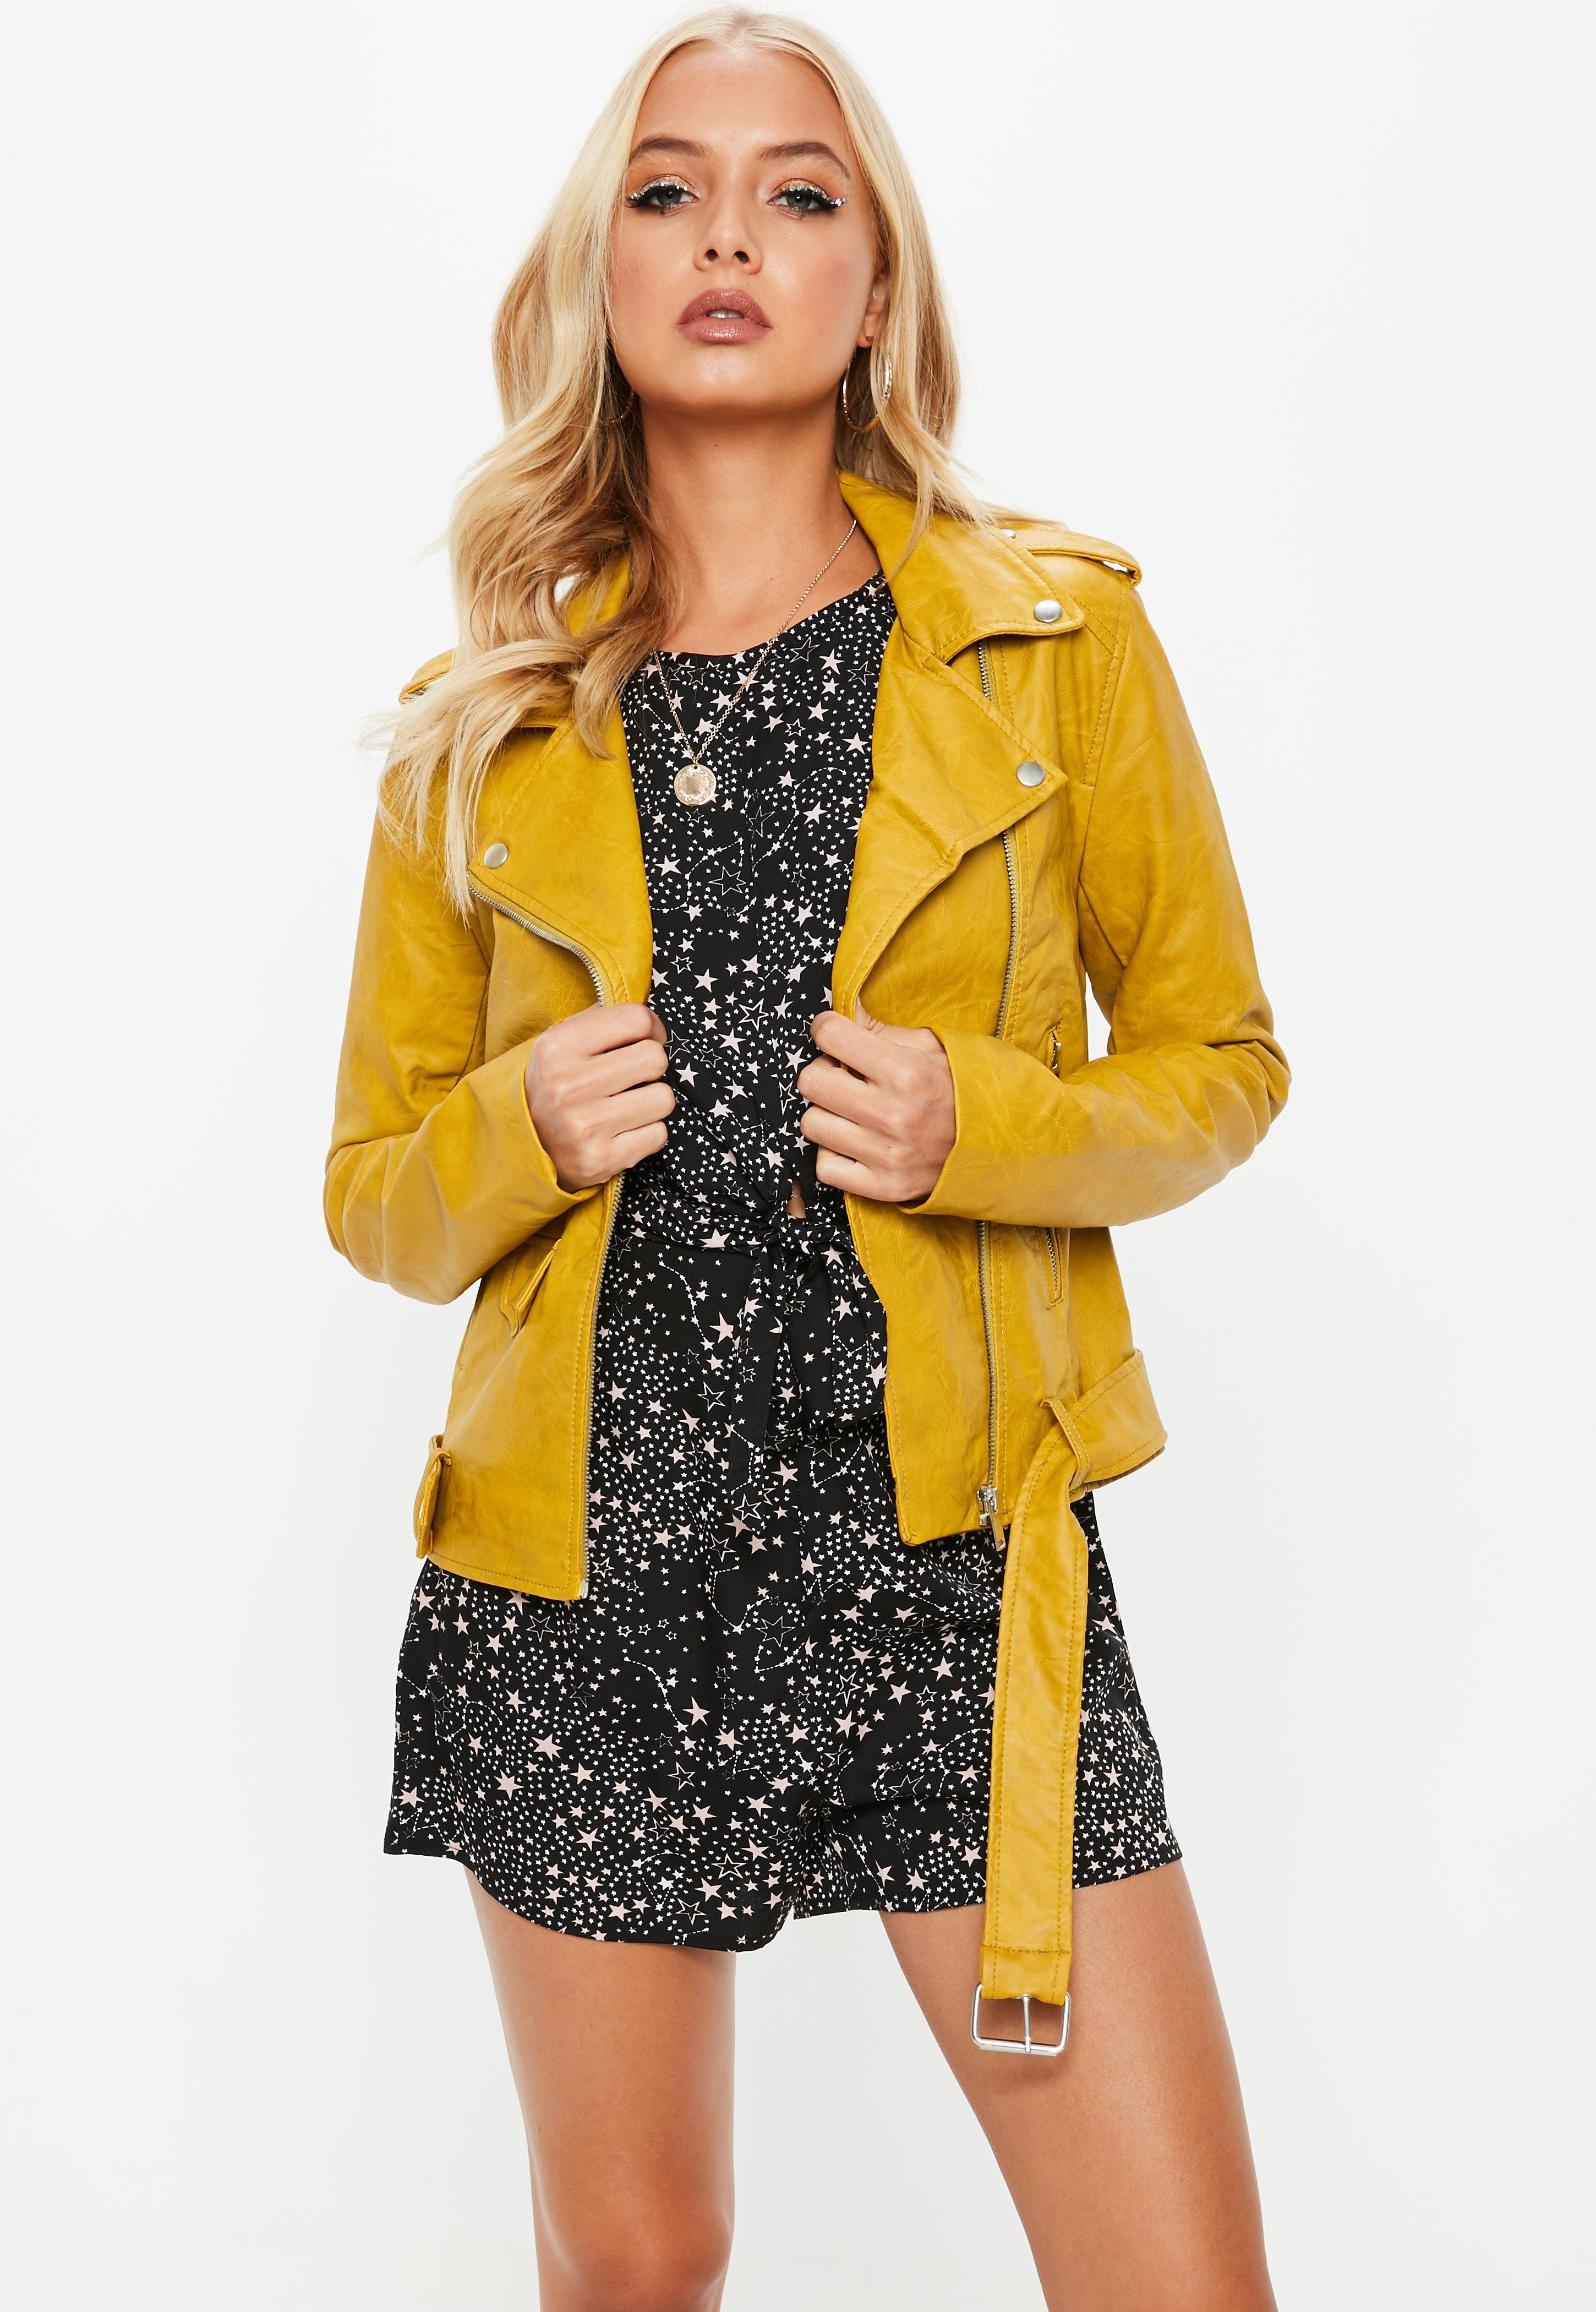 yellow jacket single asian girls Find great deals on ebay for rubber raincoat in men's coats and jackets  vintage ralph lauren women's  yellow rubber rain mac coat jacket endurance unisex.